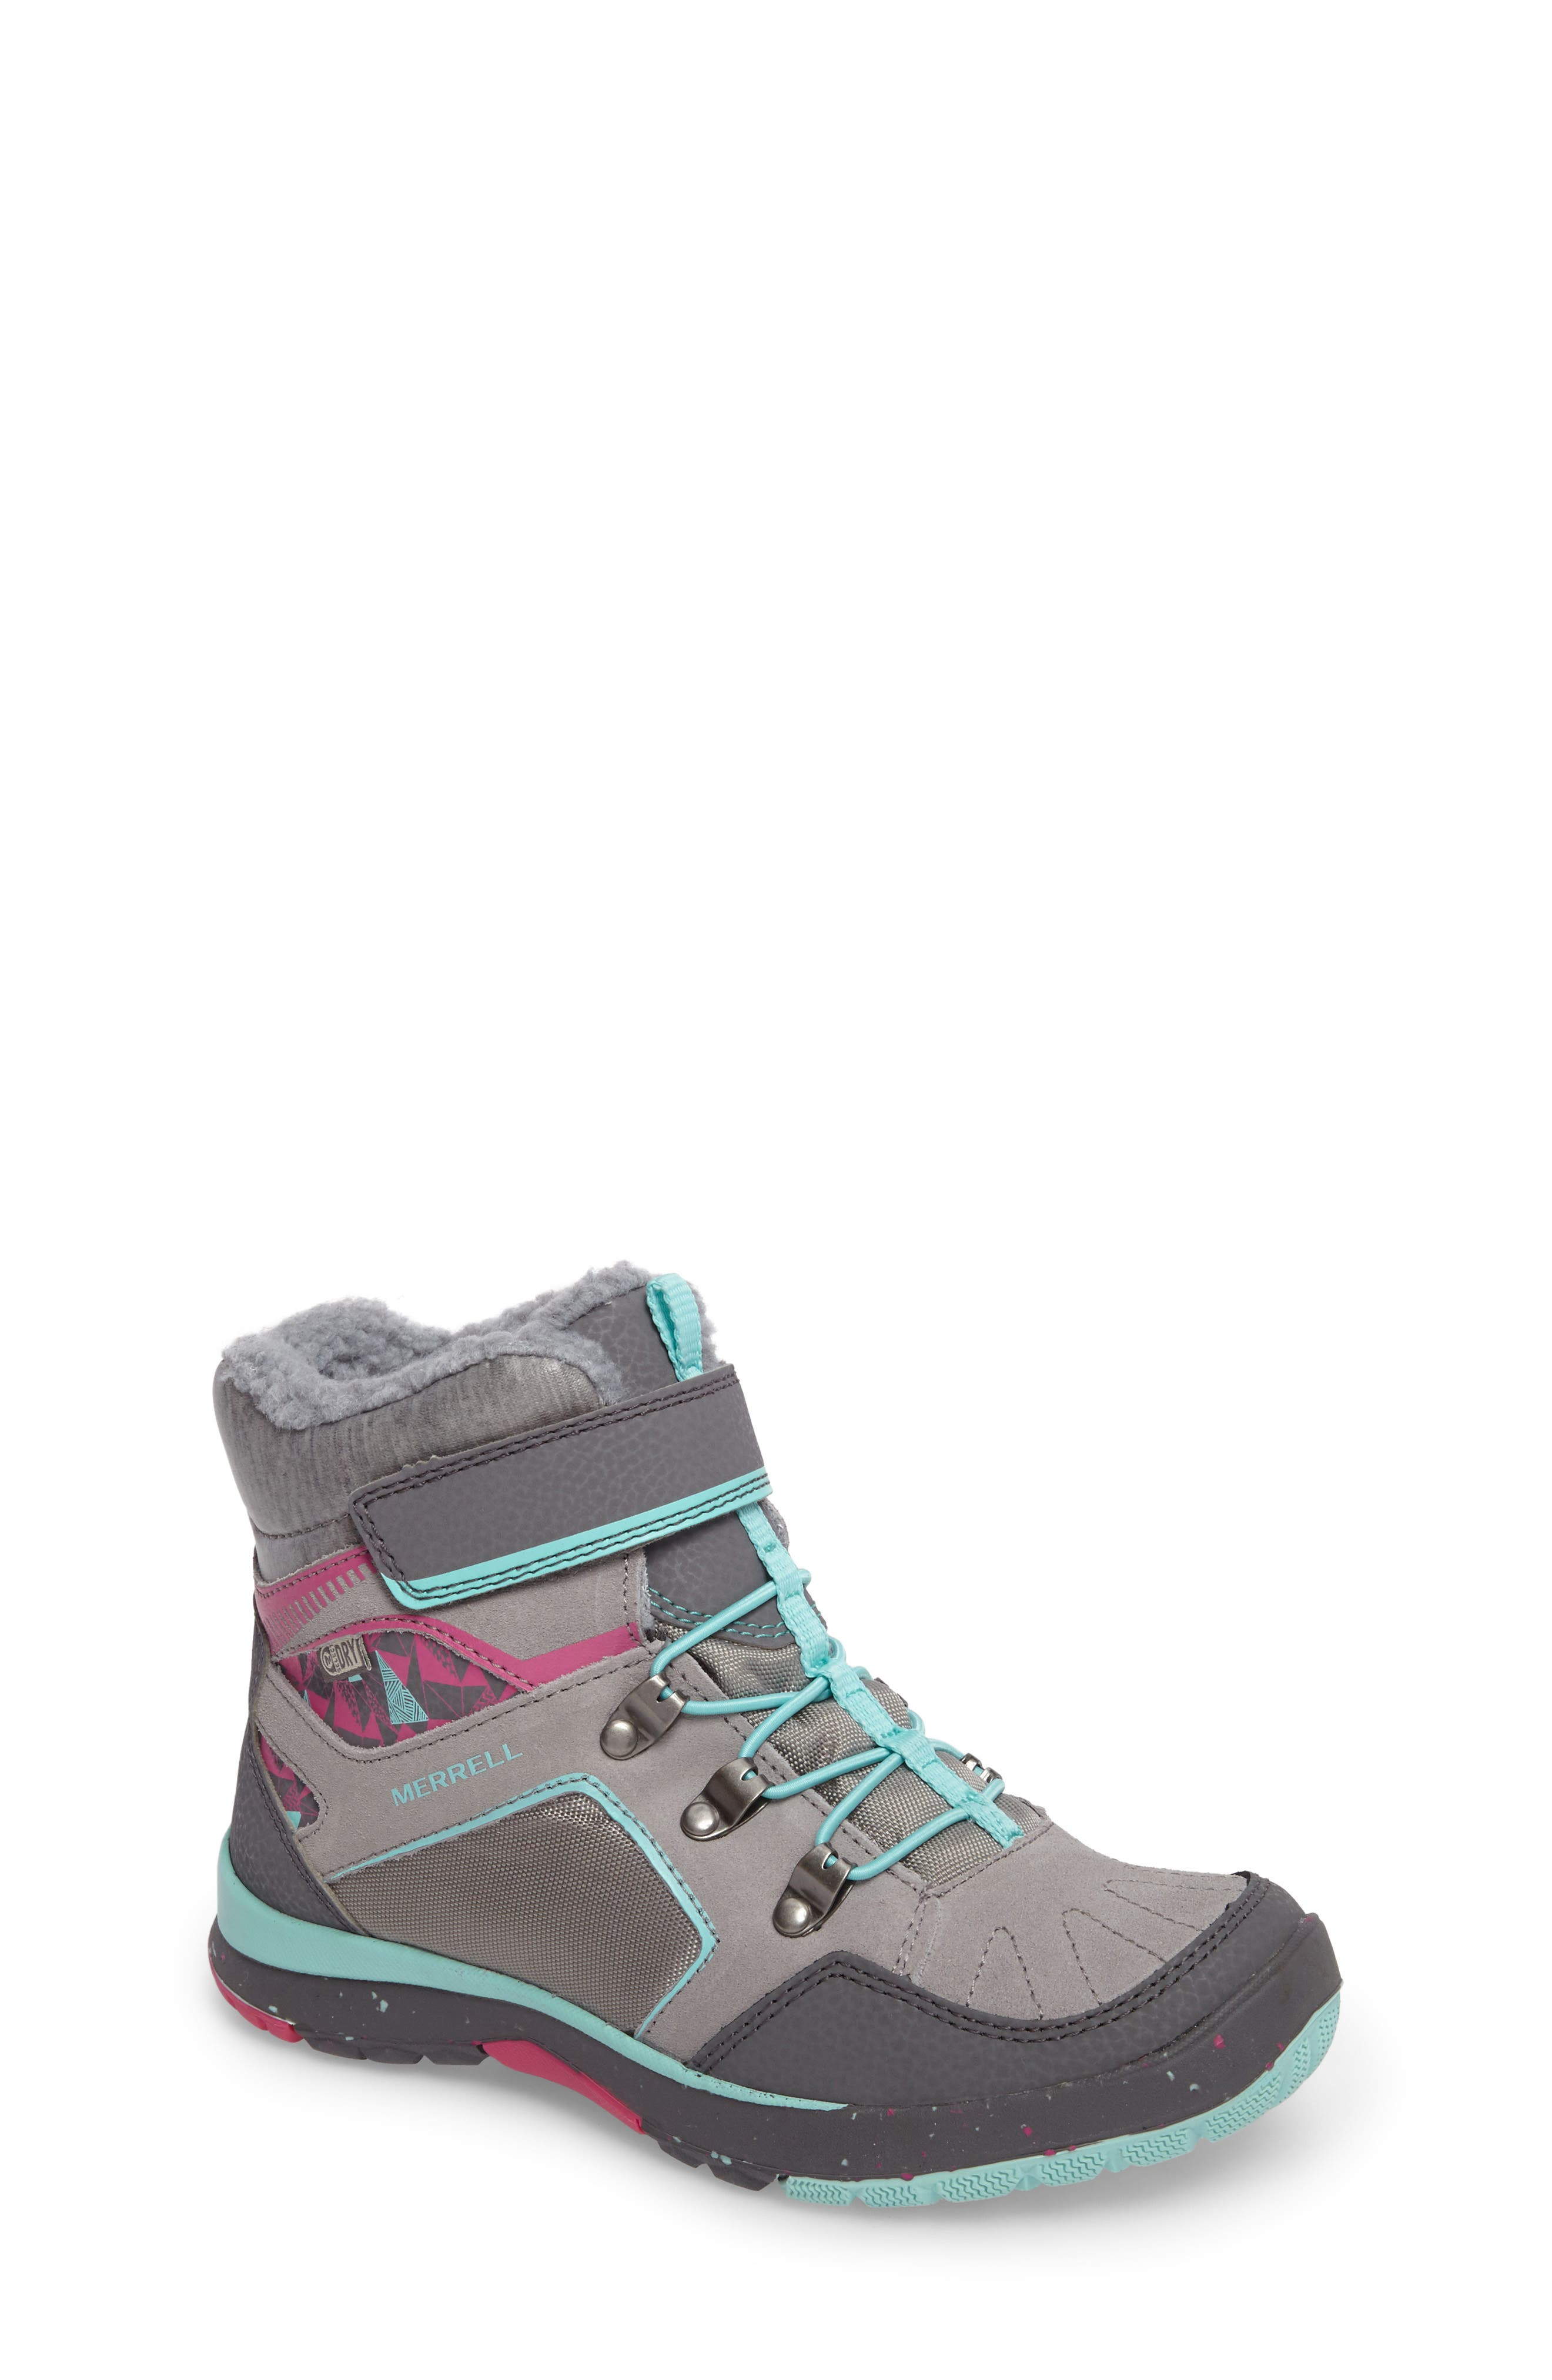 Merrell Moab FST Polar Mid Waterproof Insulated Sneaker Boot (Toddler, Little Kid & Big Kid)